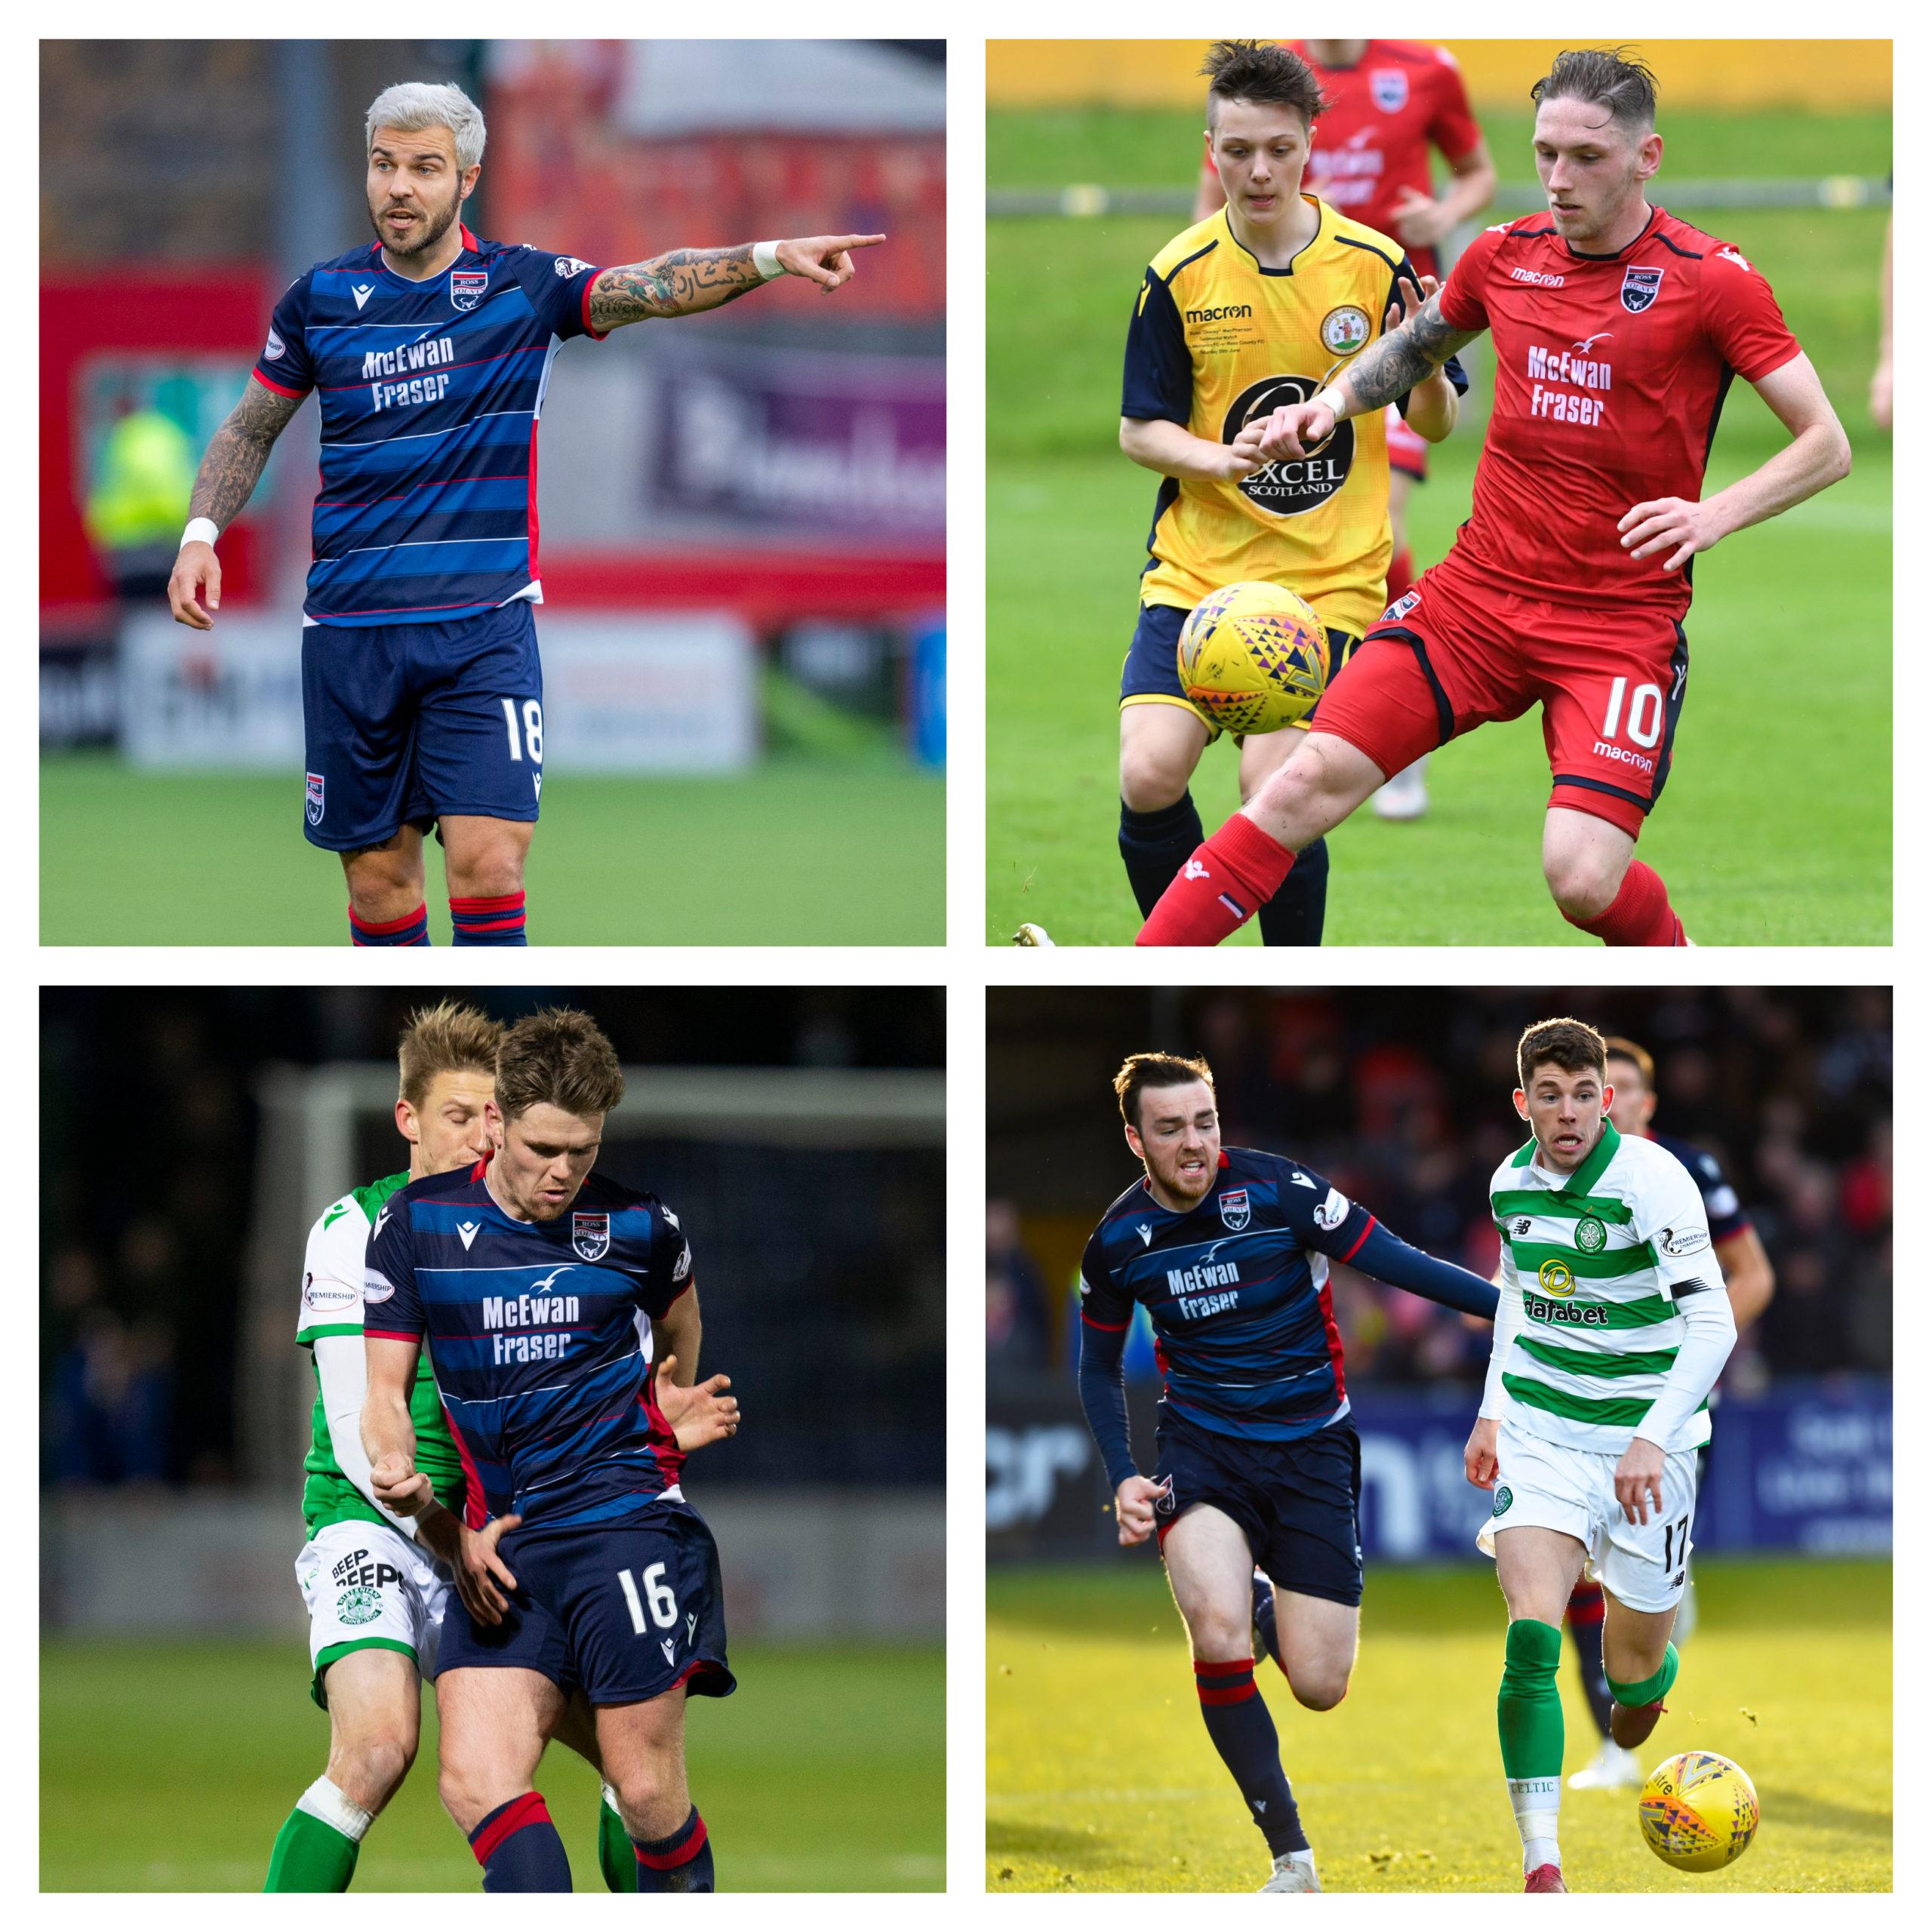 Clockwise from top left: Richard Foster, Declan McManus, Sean Kelly, Lewis Spence